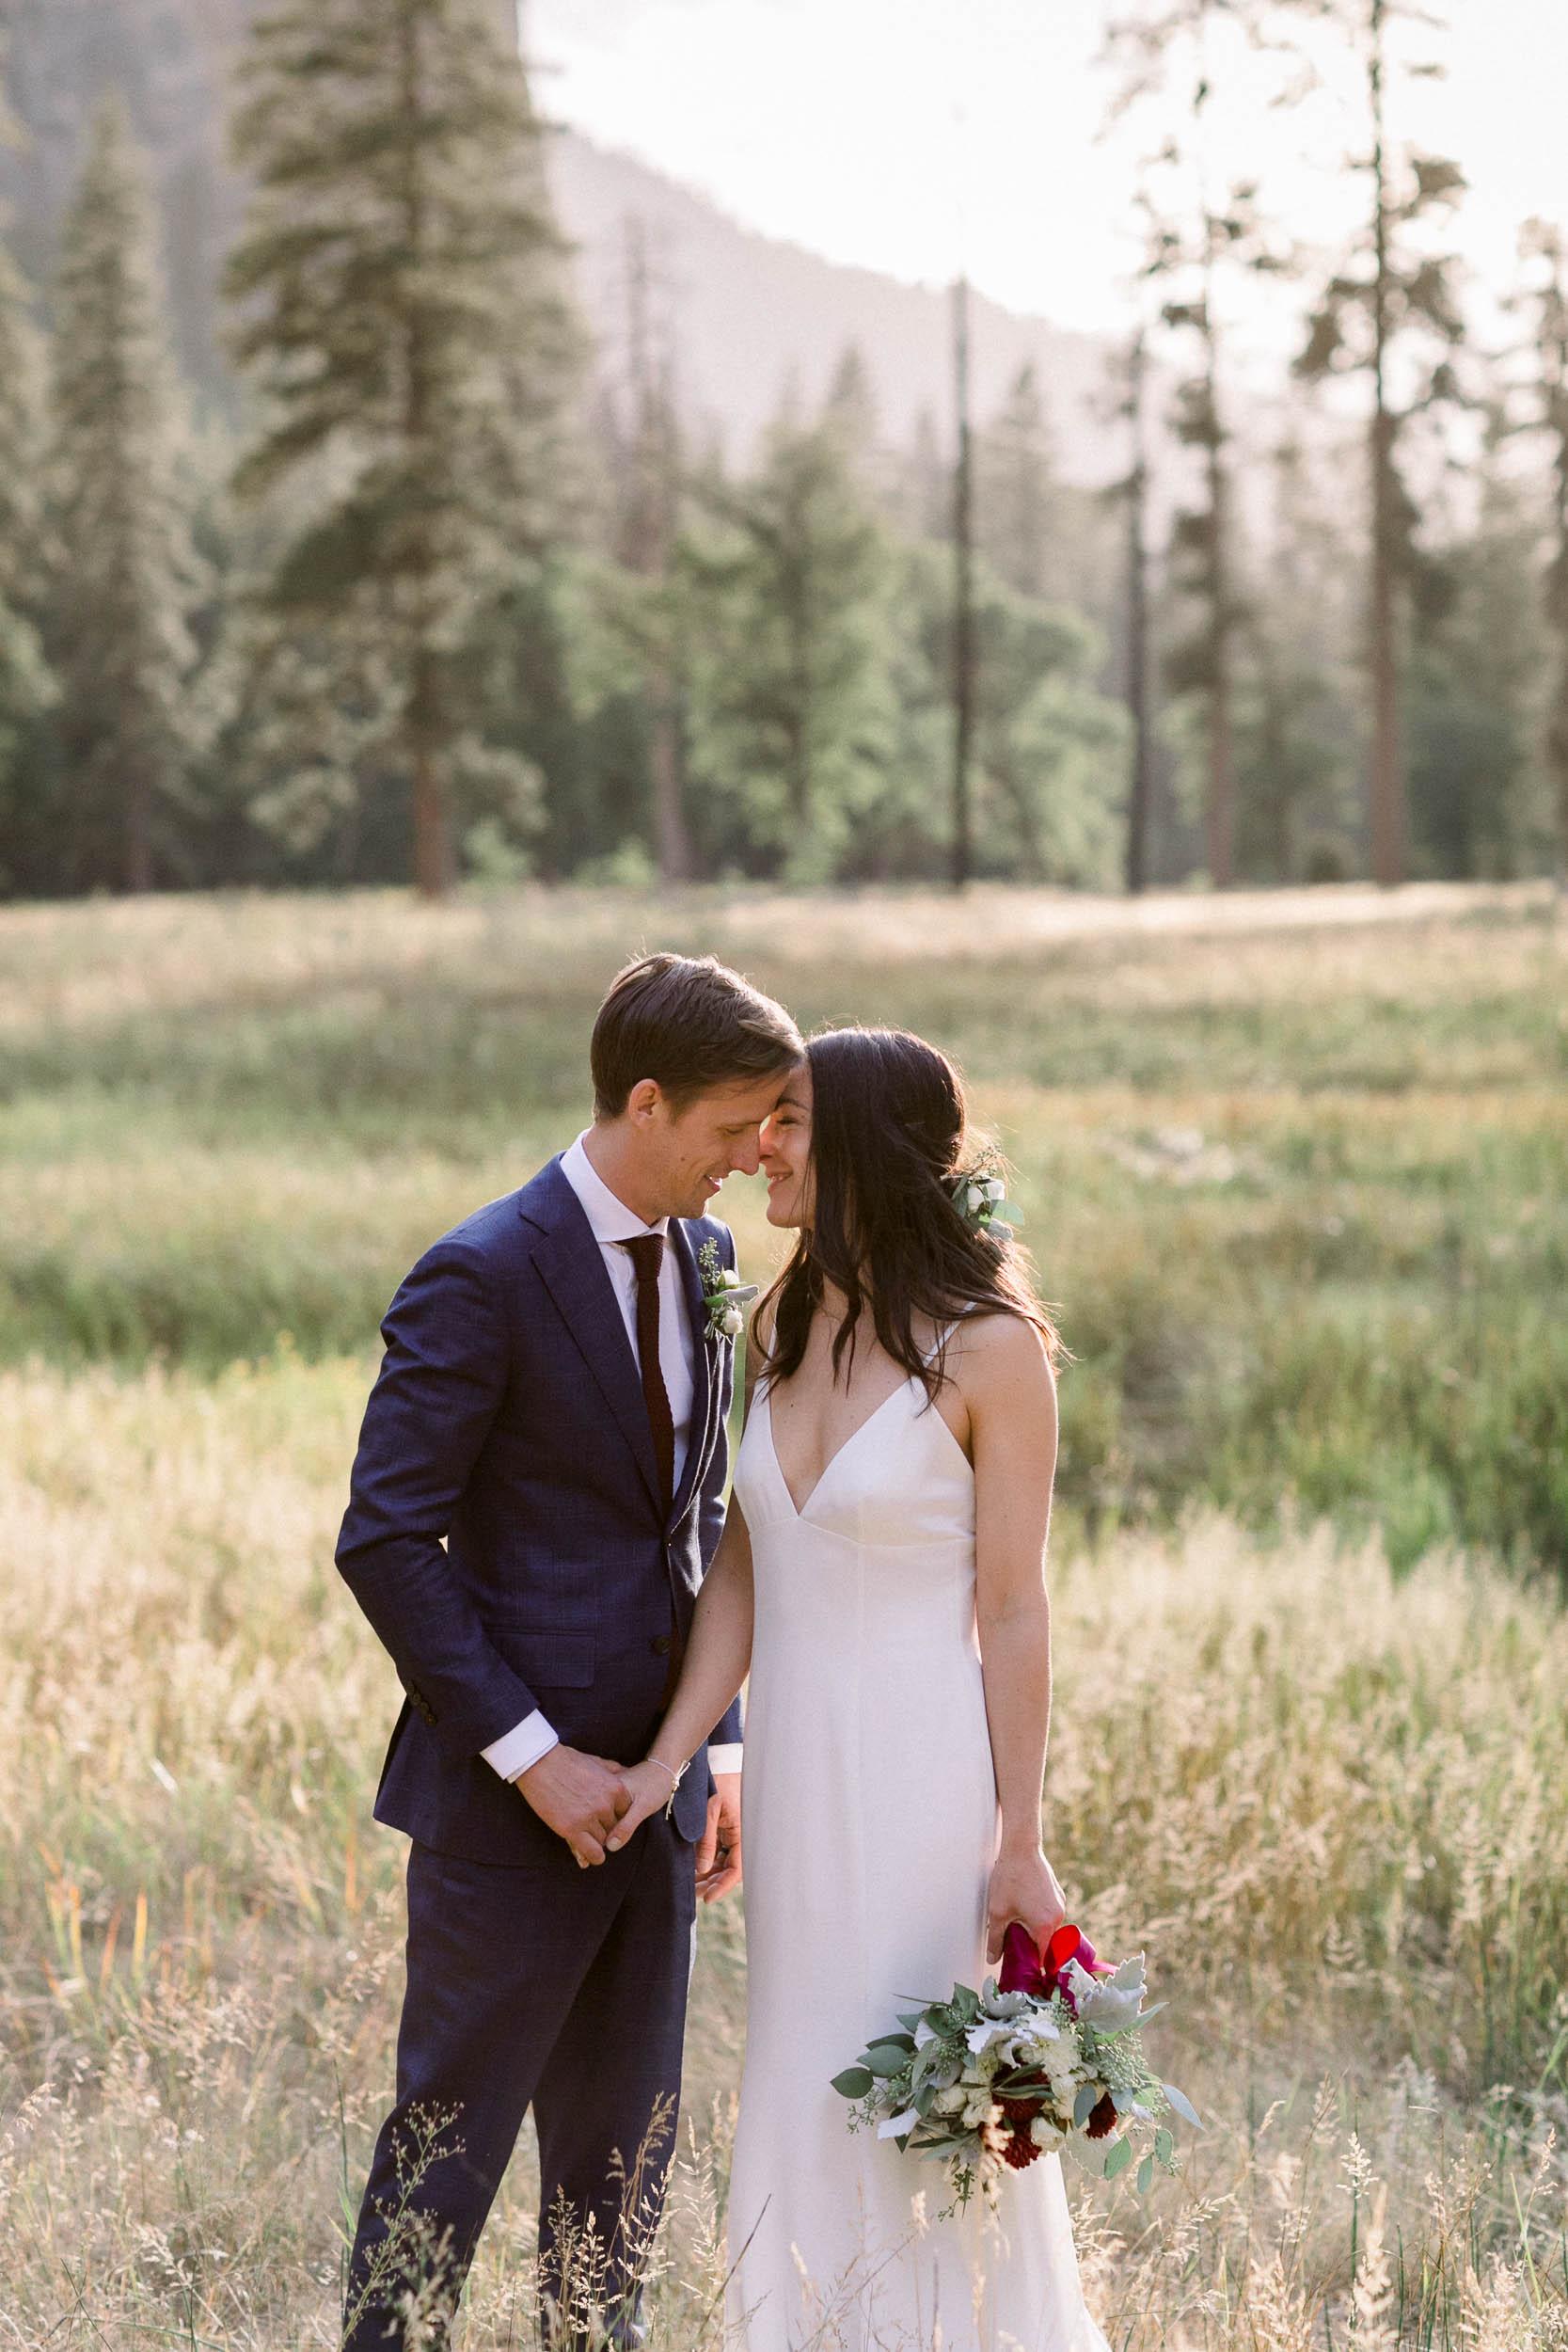 Intimate Yosemite Wedding_Buena Lane Photography_091318ER500.jpg